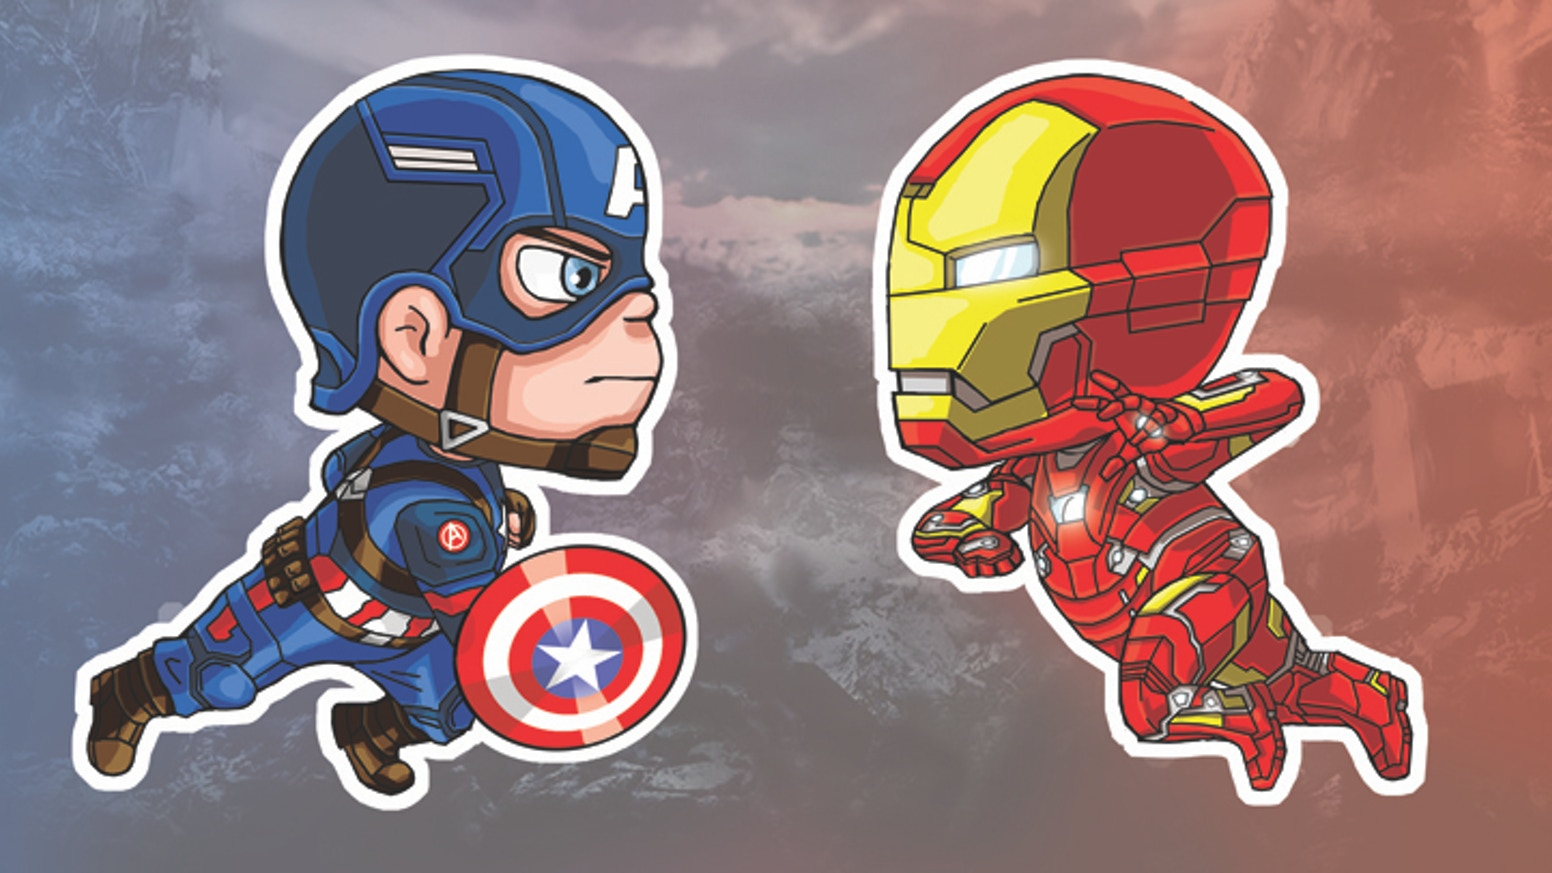 Captain america vs iron man stickers